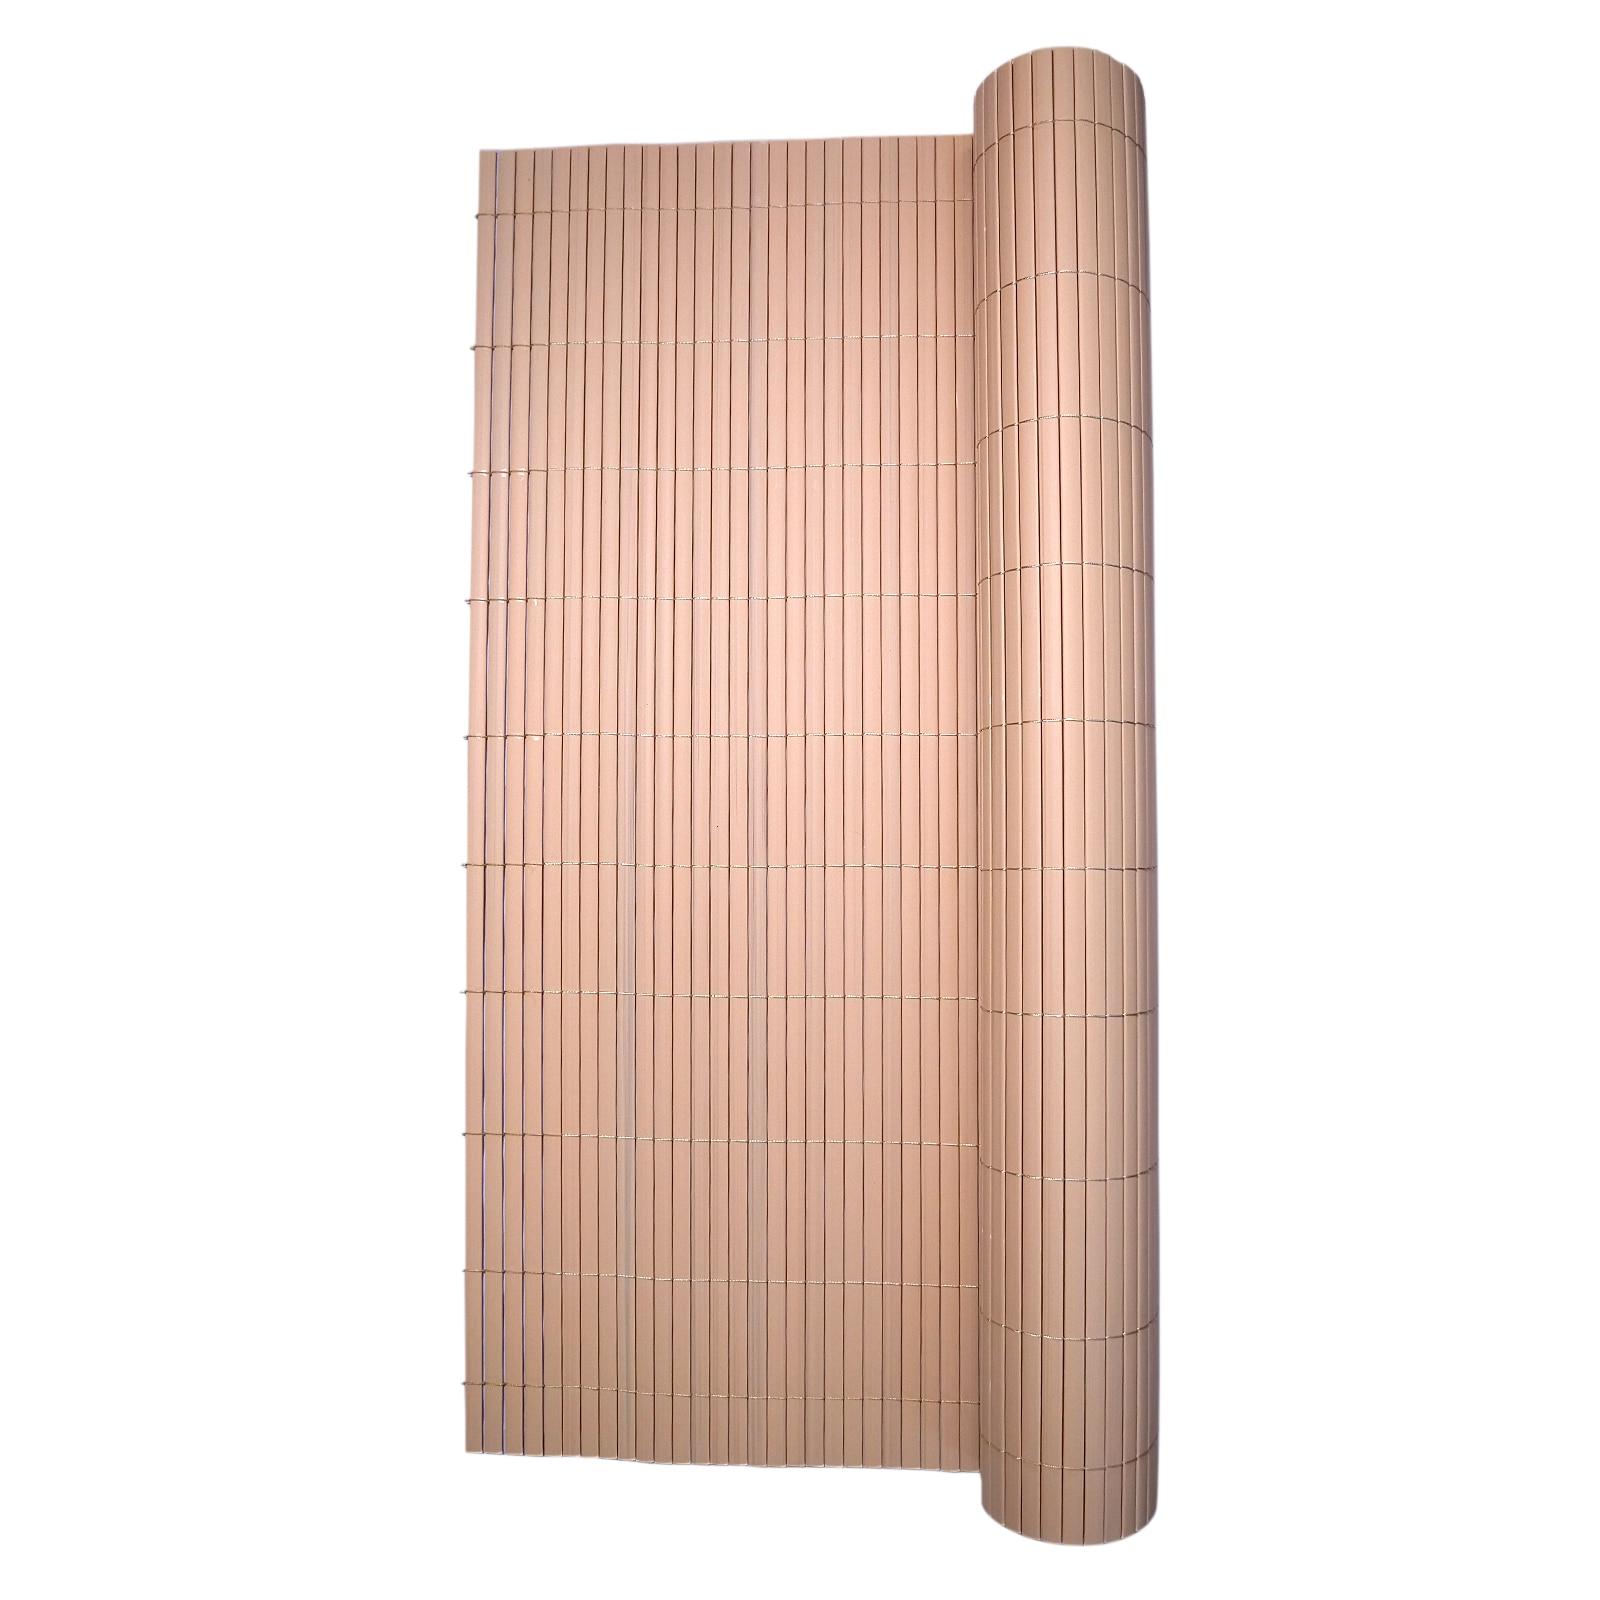 Paravan Pentru Balcon Terasa Gard Pvc 1x3m Tip Bambus 1300g M2 Uv Emag Ro